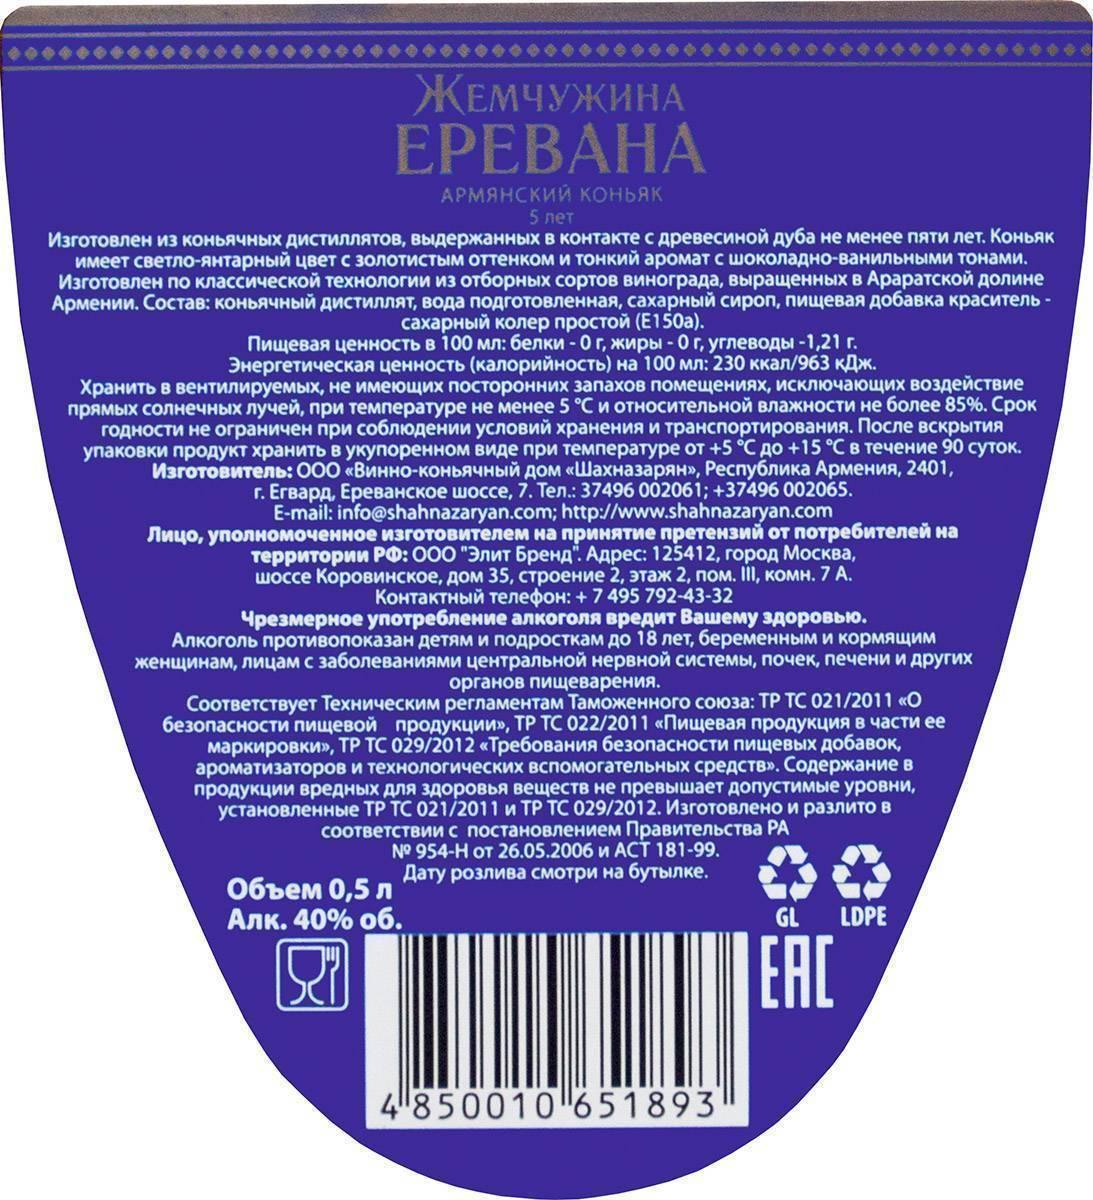 Обзор коньяка Жемчужина Еревана